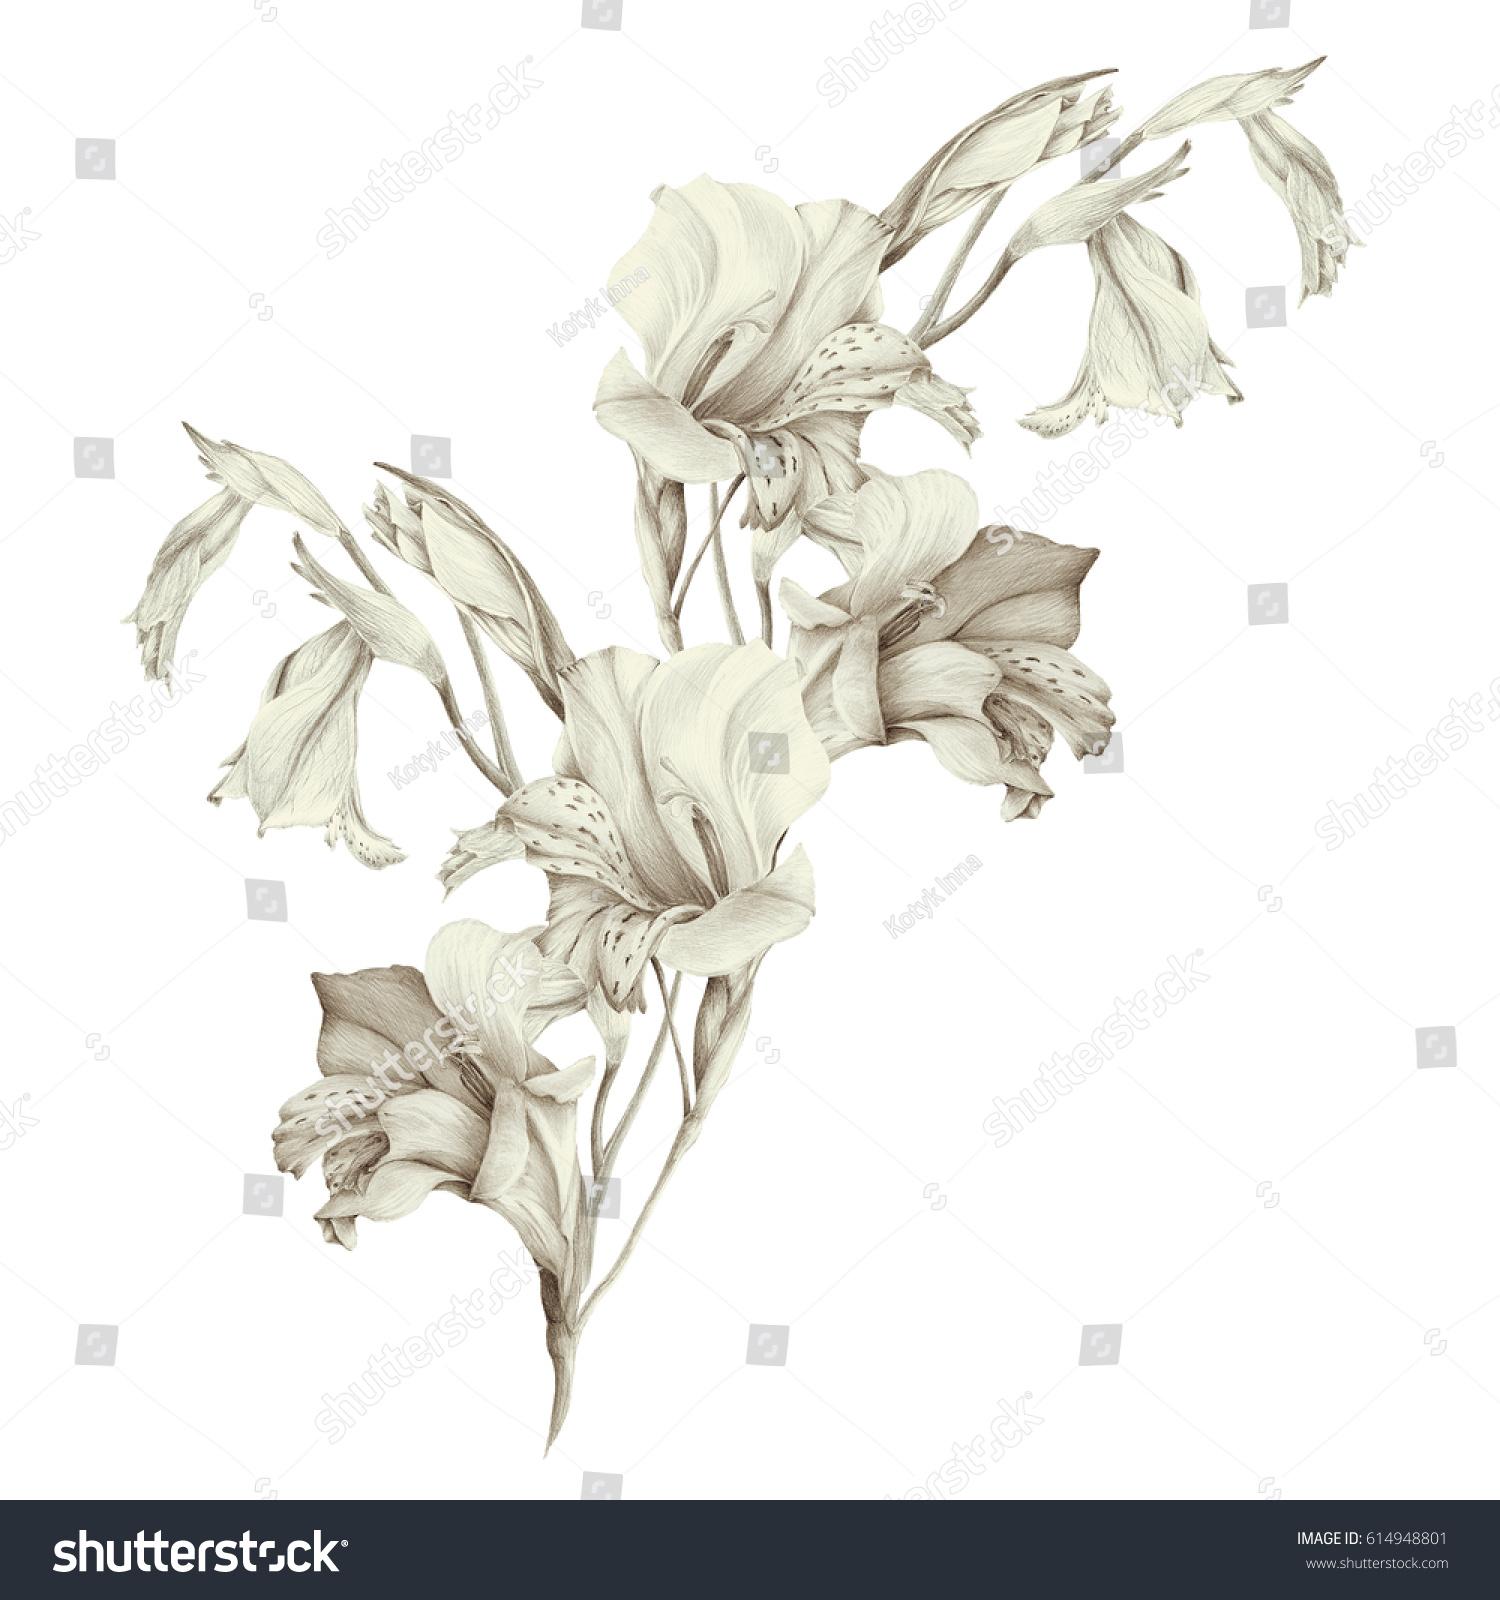 Gladiolus Abstract Wallpaper Floral Motifs Wallpaper Stock